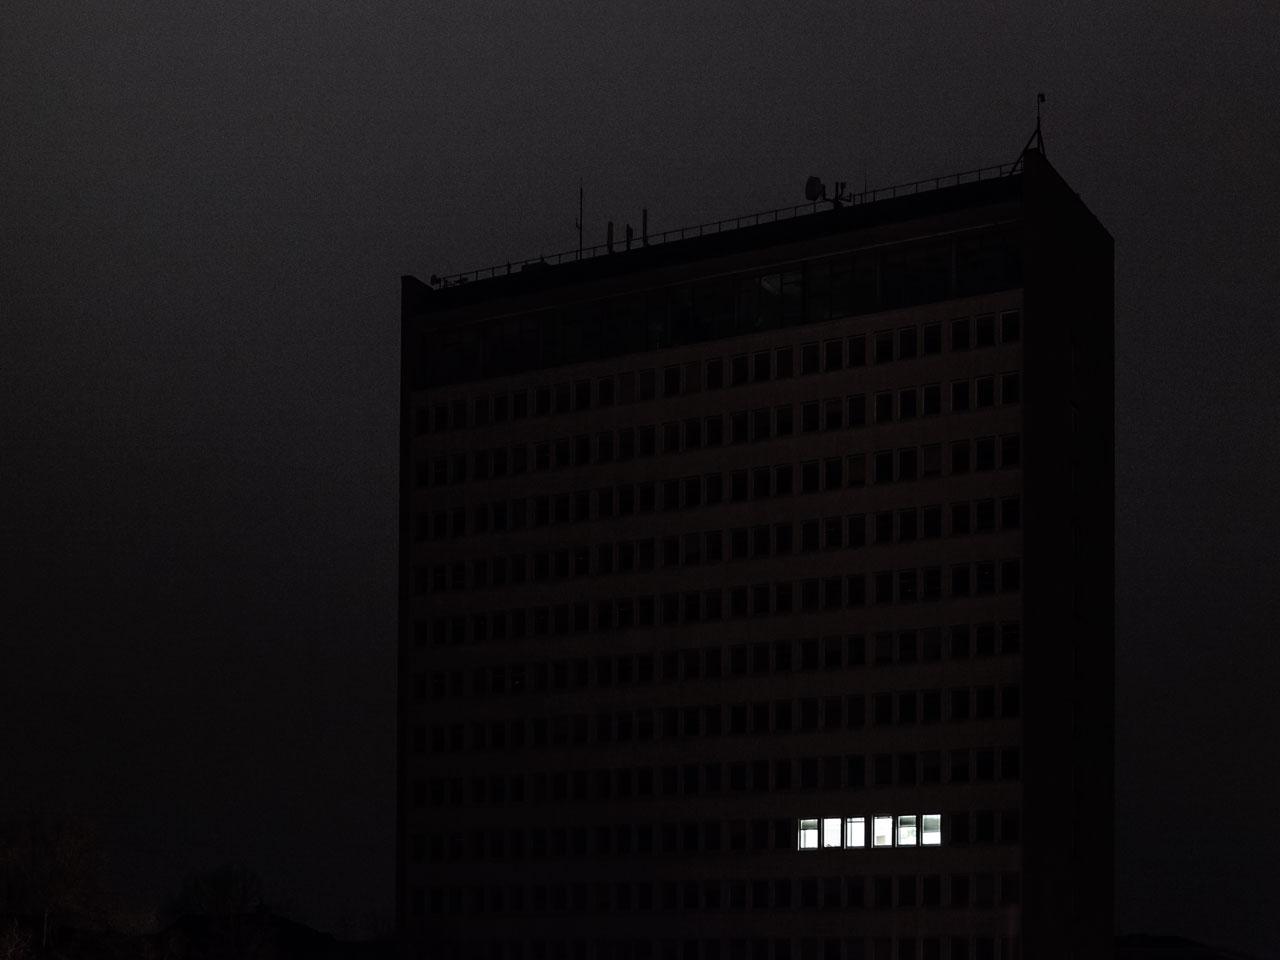 Christof Pluemacher - Urban Darkness - Felix Schoeller Photoaward